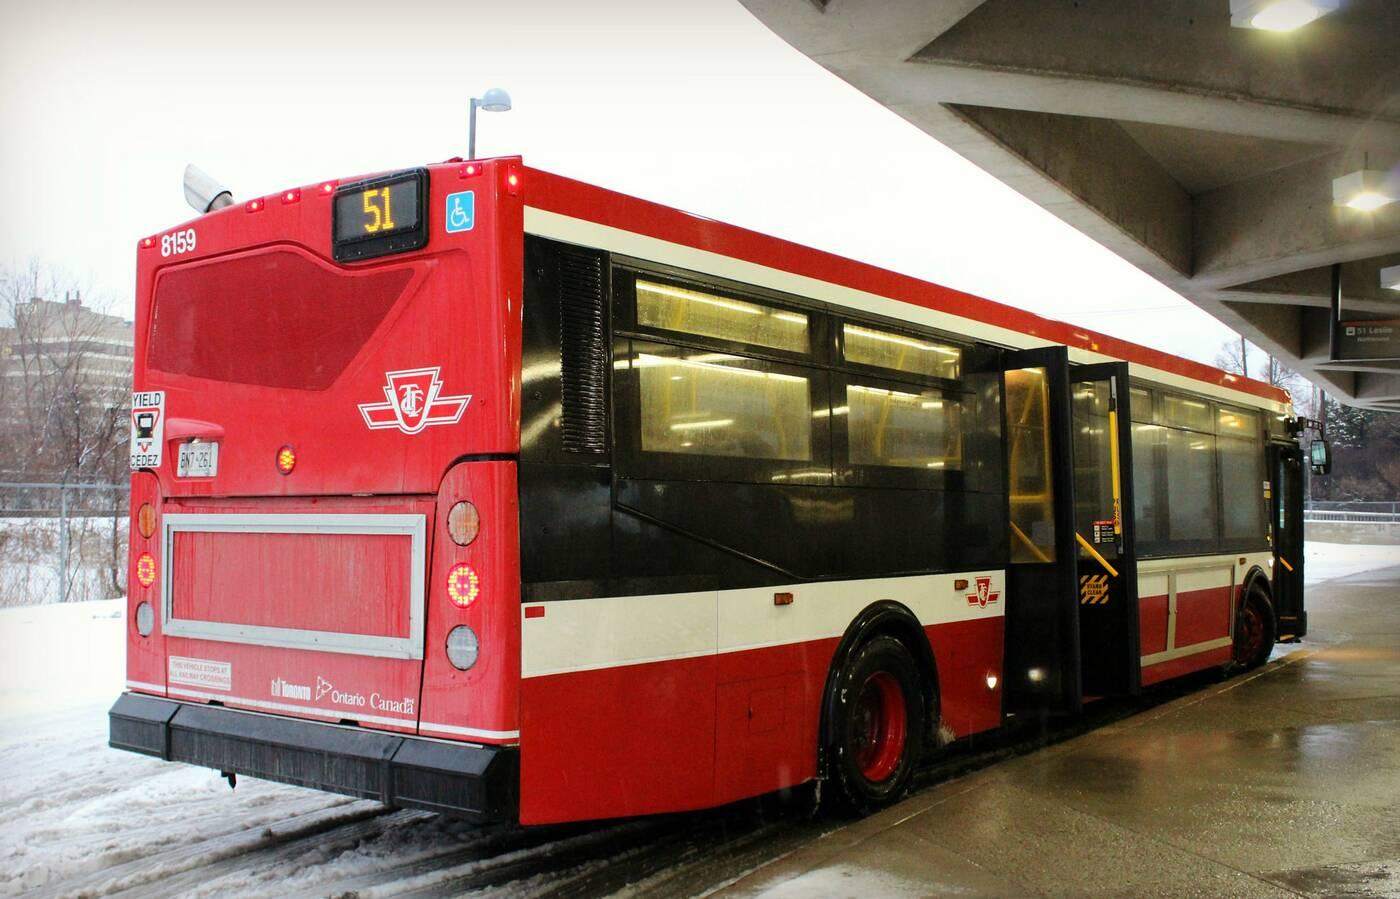 ttc new look bus